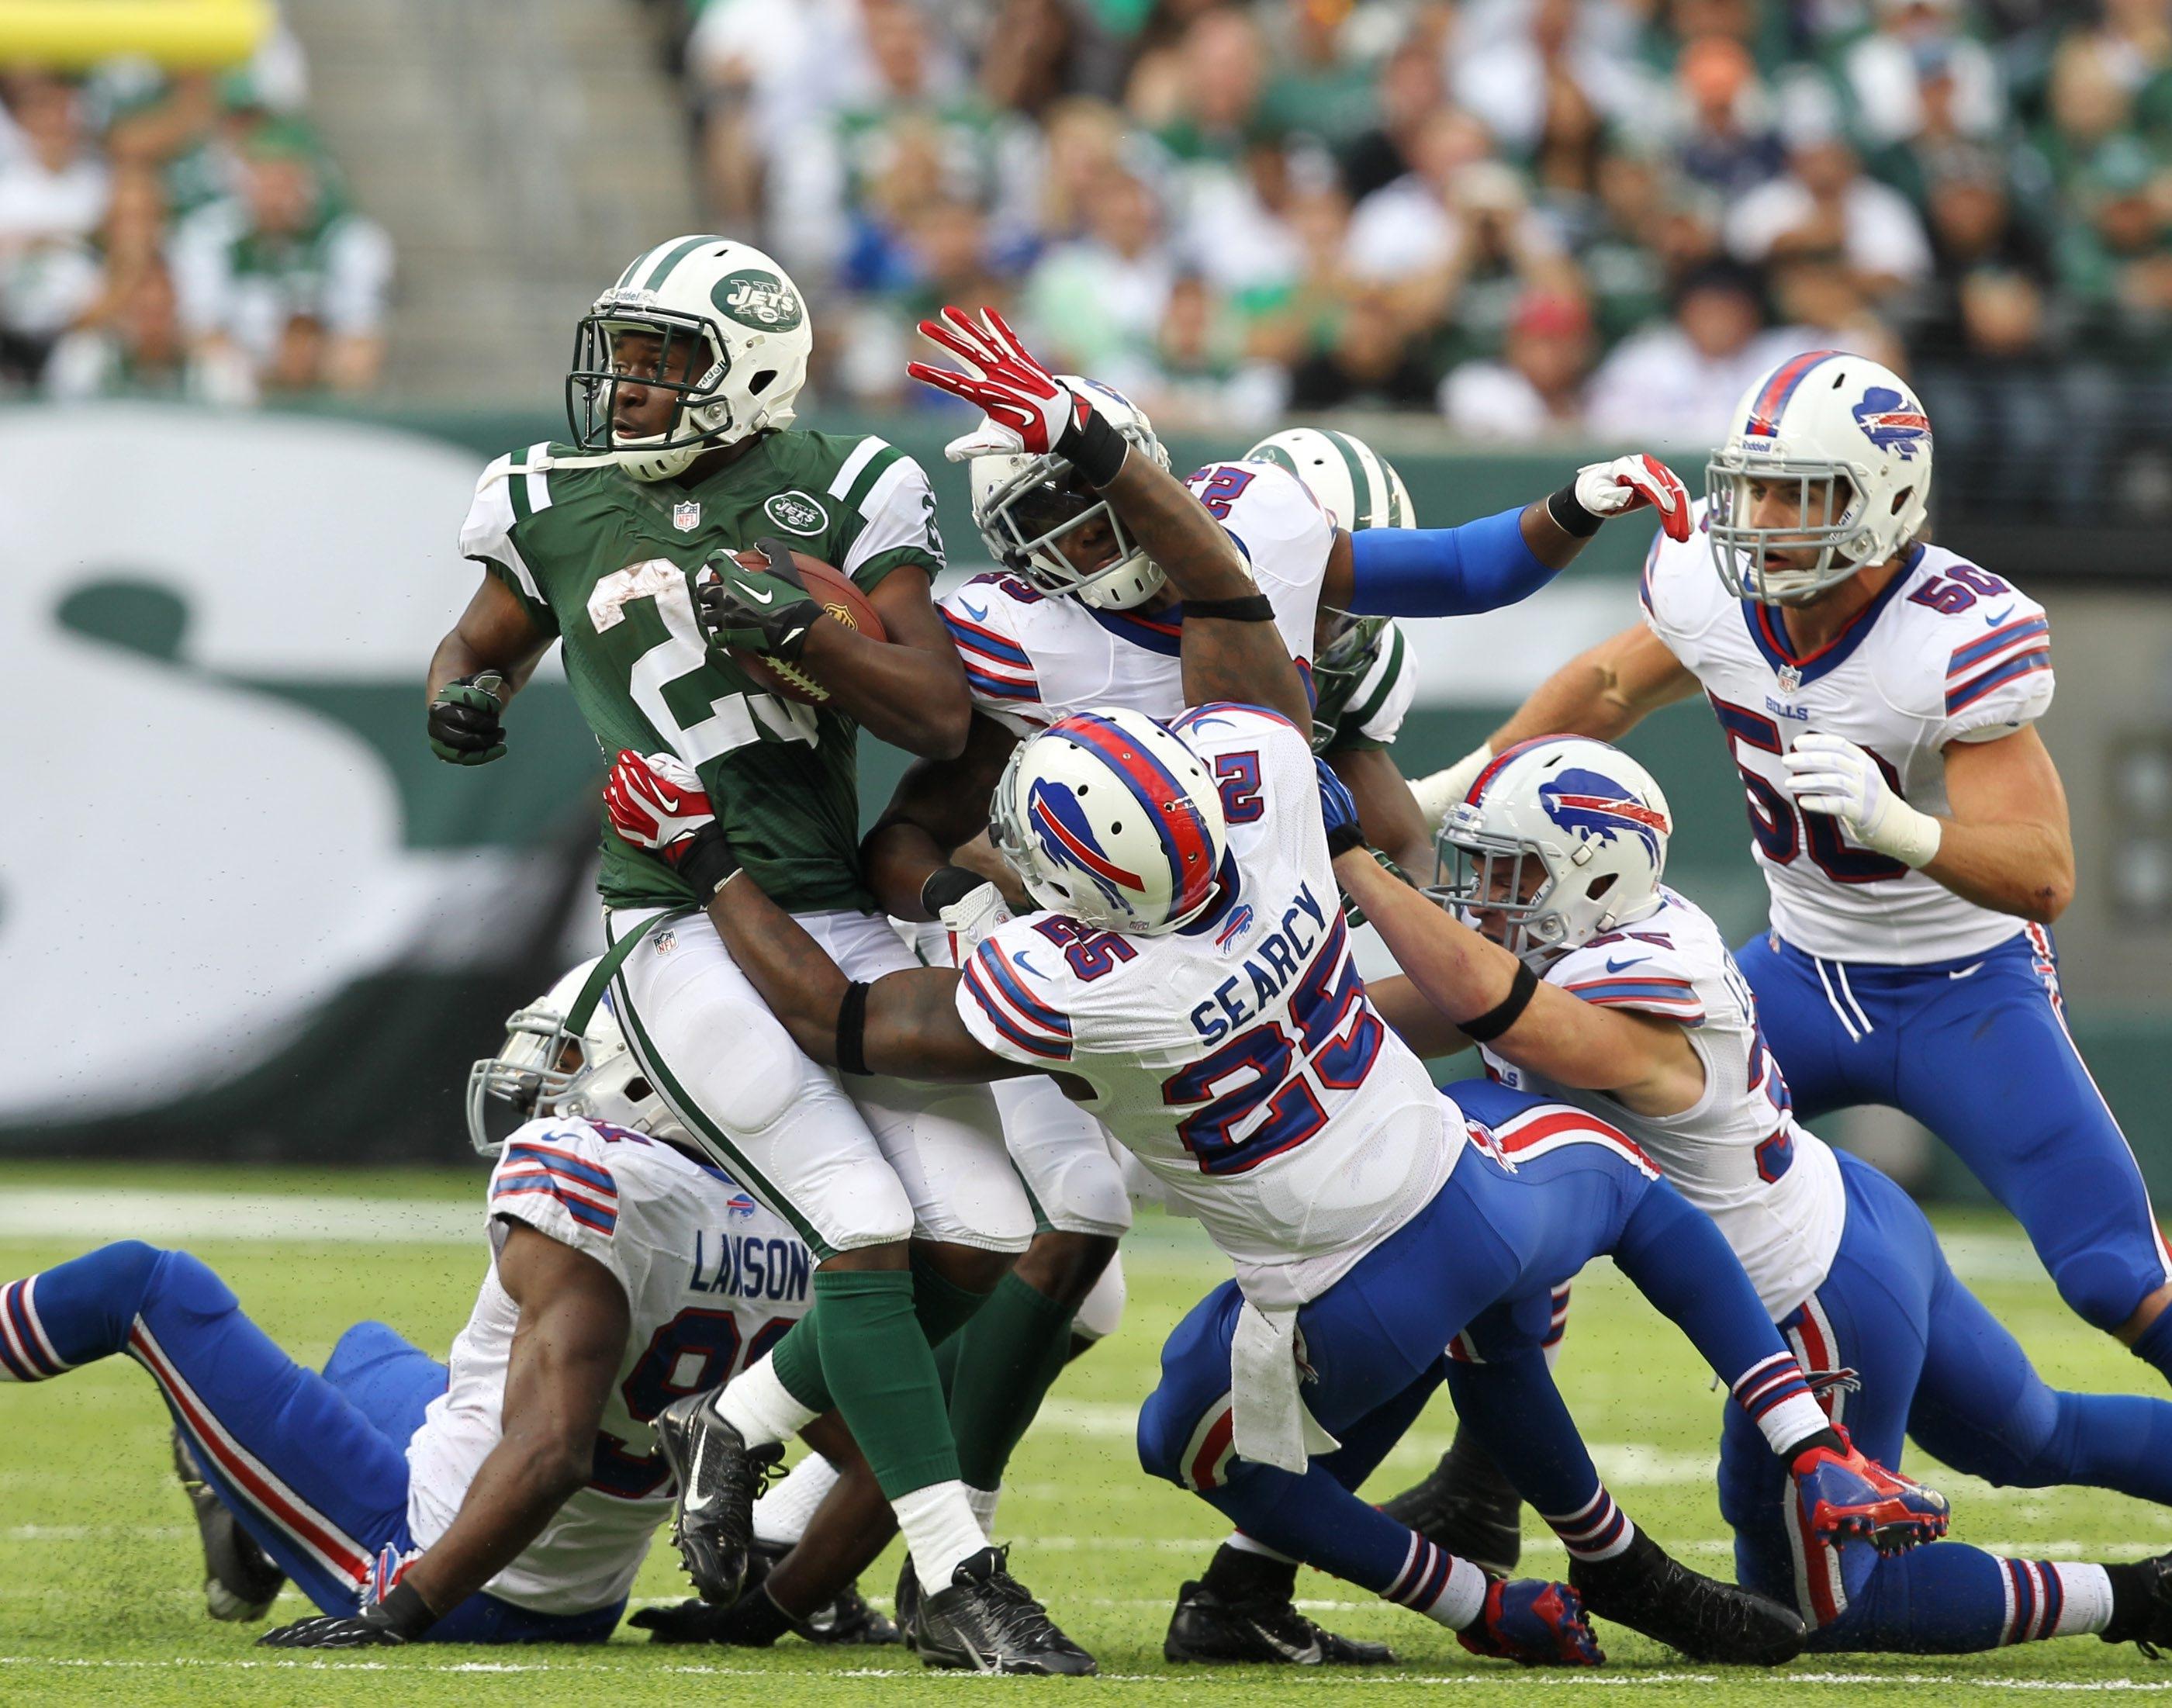 Jets running back Bilal Powell (29) runs over the Bills defense in first half play on Sunday.